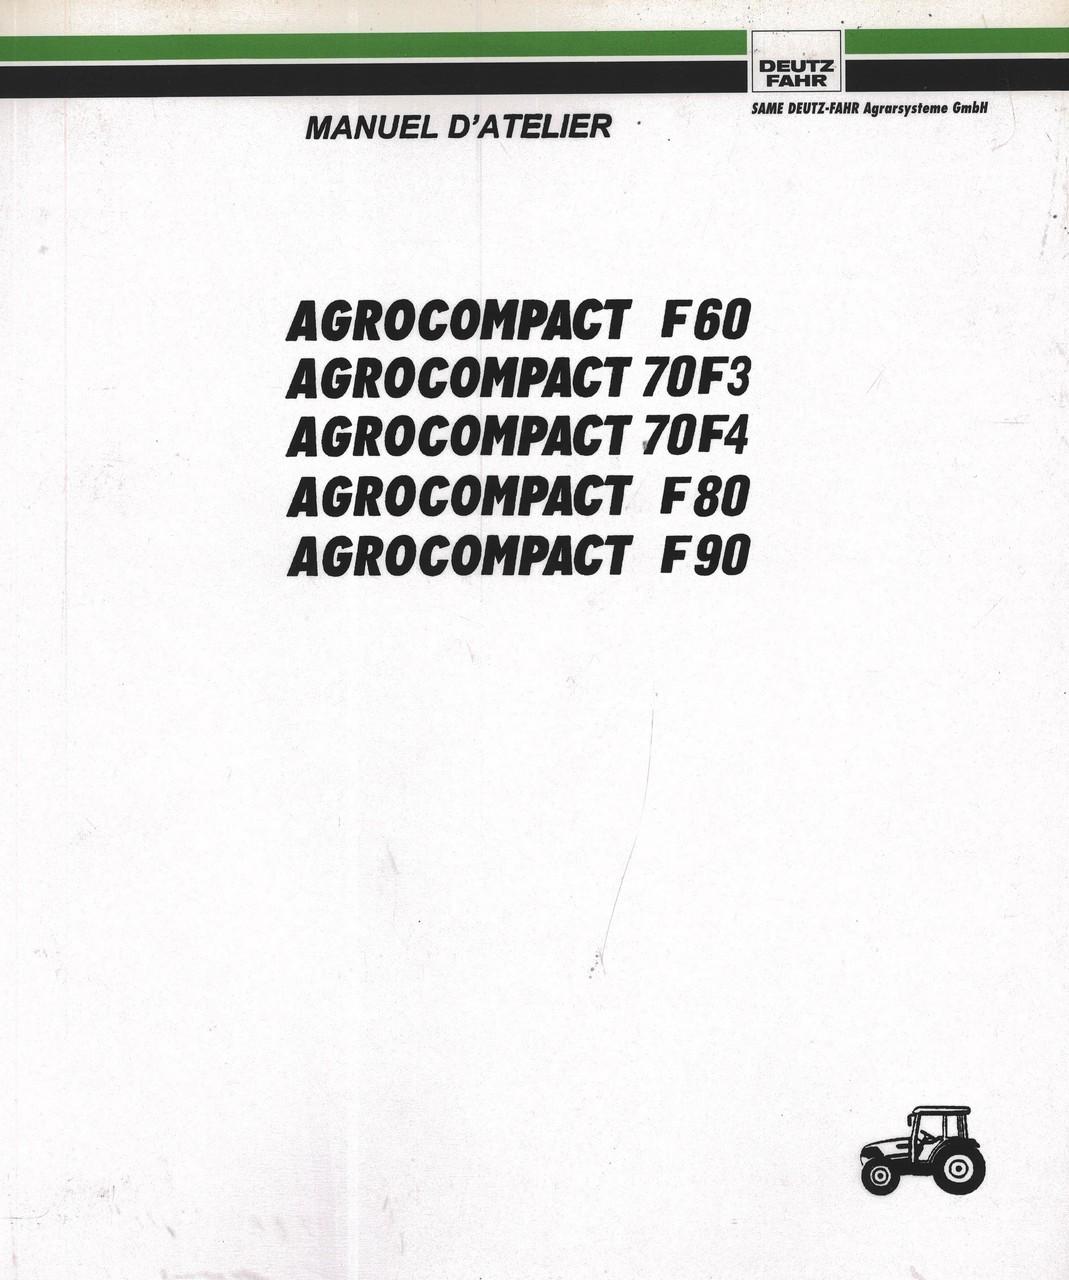 AGROCOMPACT F 60 - AGROCOMPACT 70 F3 - AGROCOMPACT 70 F4 - AGROCOMPACT F 80 - AGROCOMPACT F 90 - Manuel d'atelier